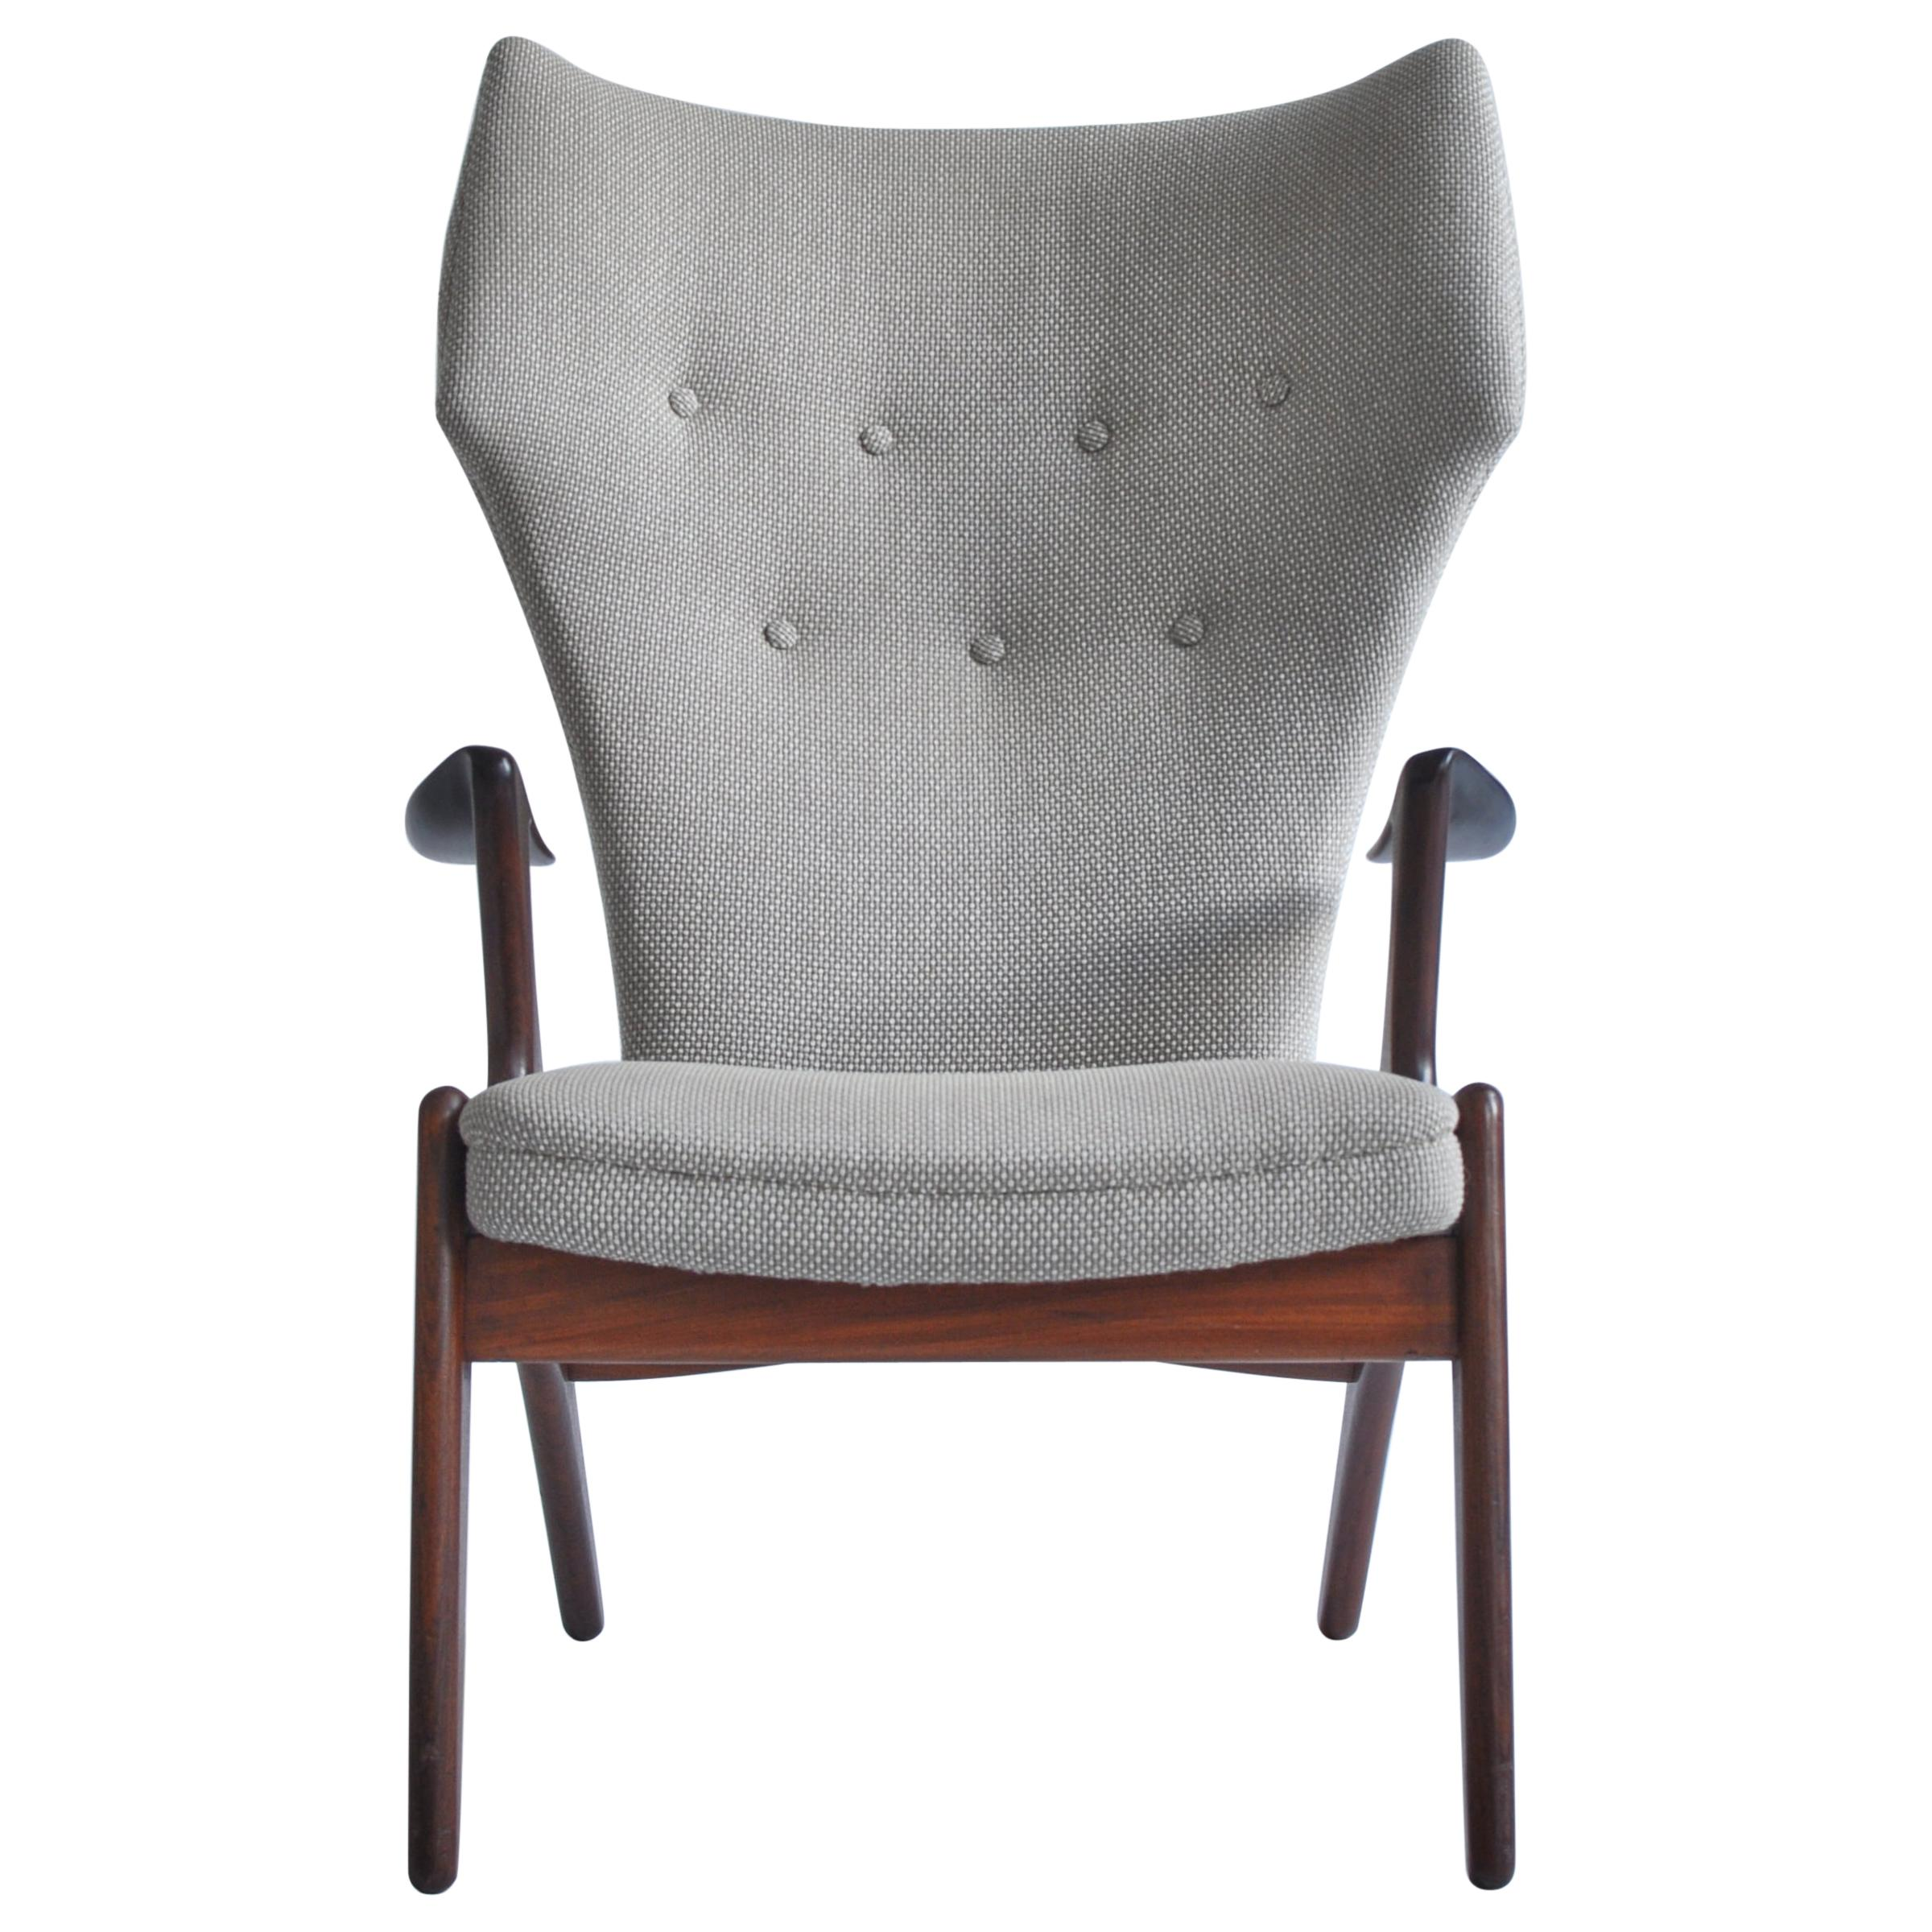 Danish Modern Wing Chair in Teakwood by Kurt Østervig, 1950s